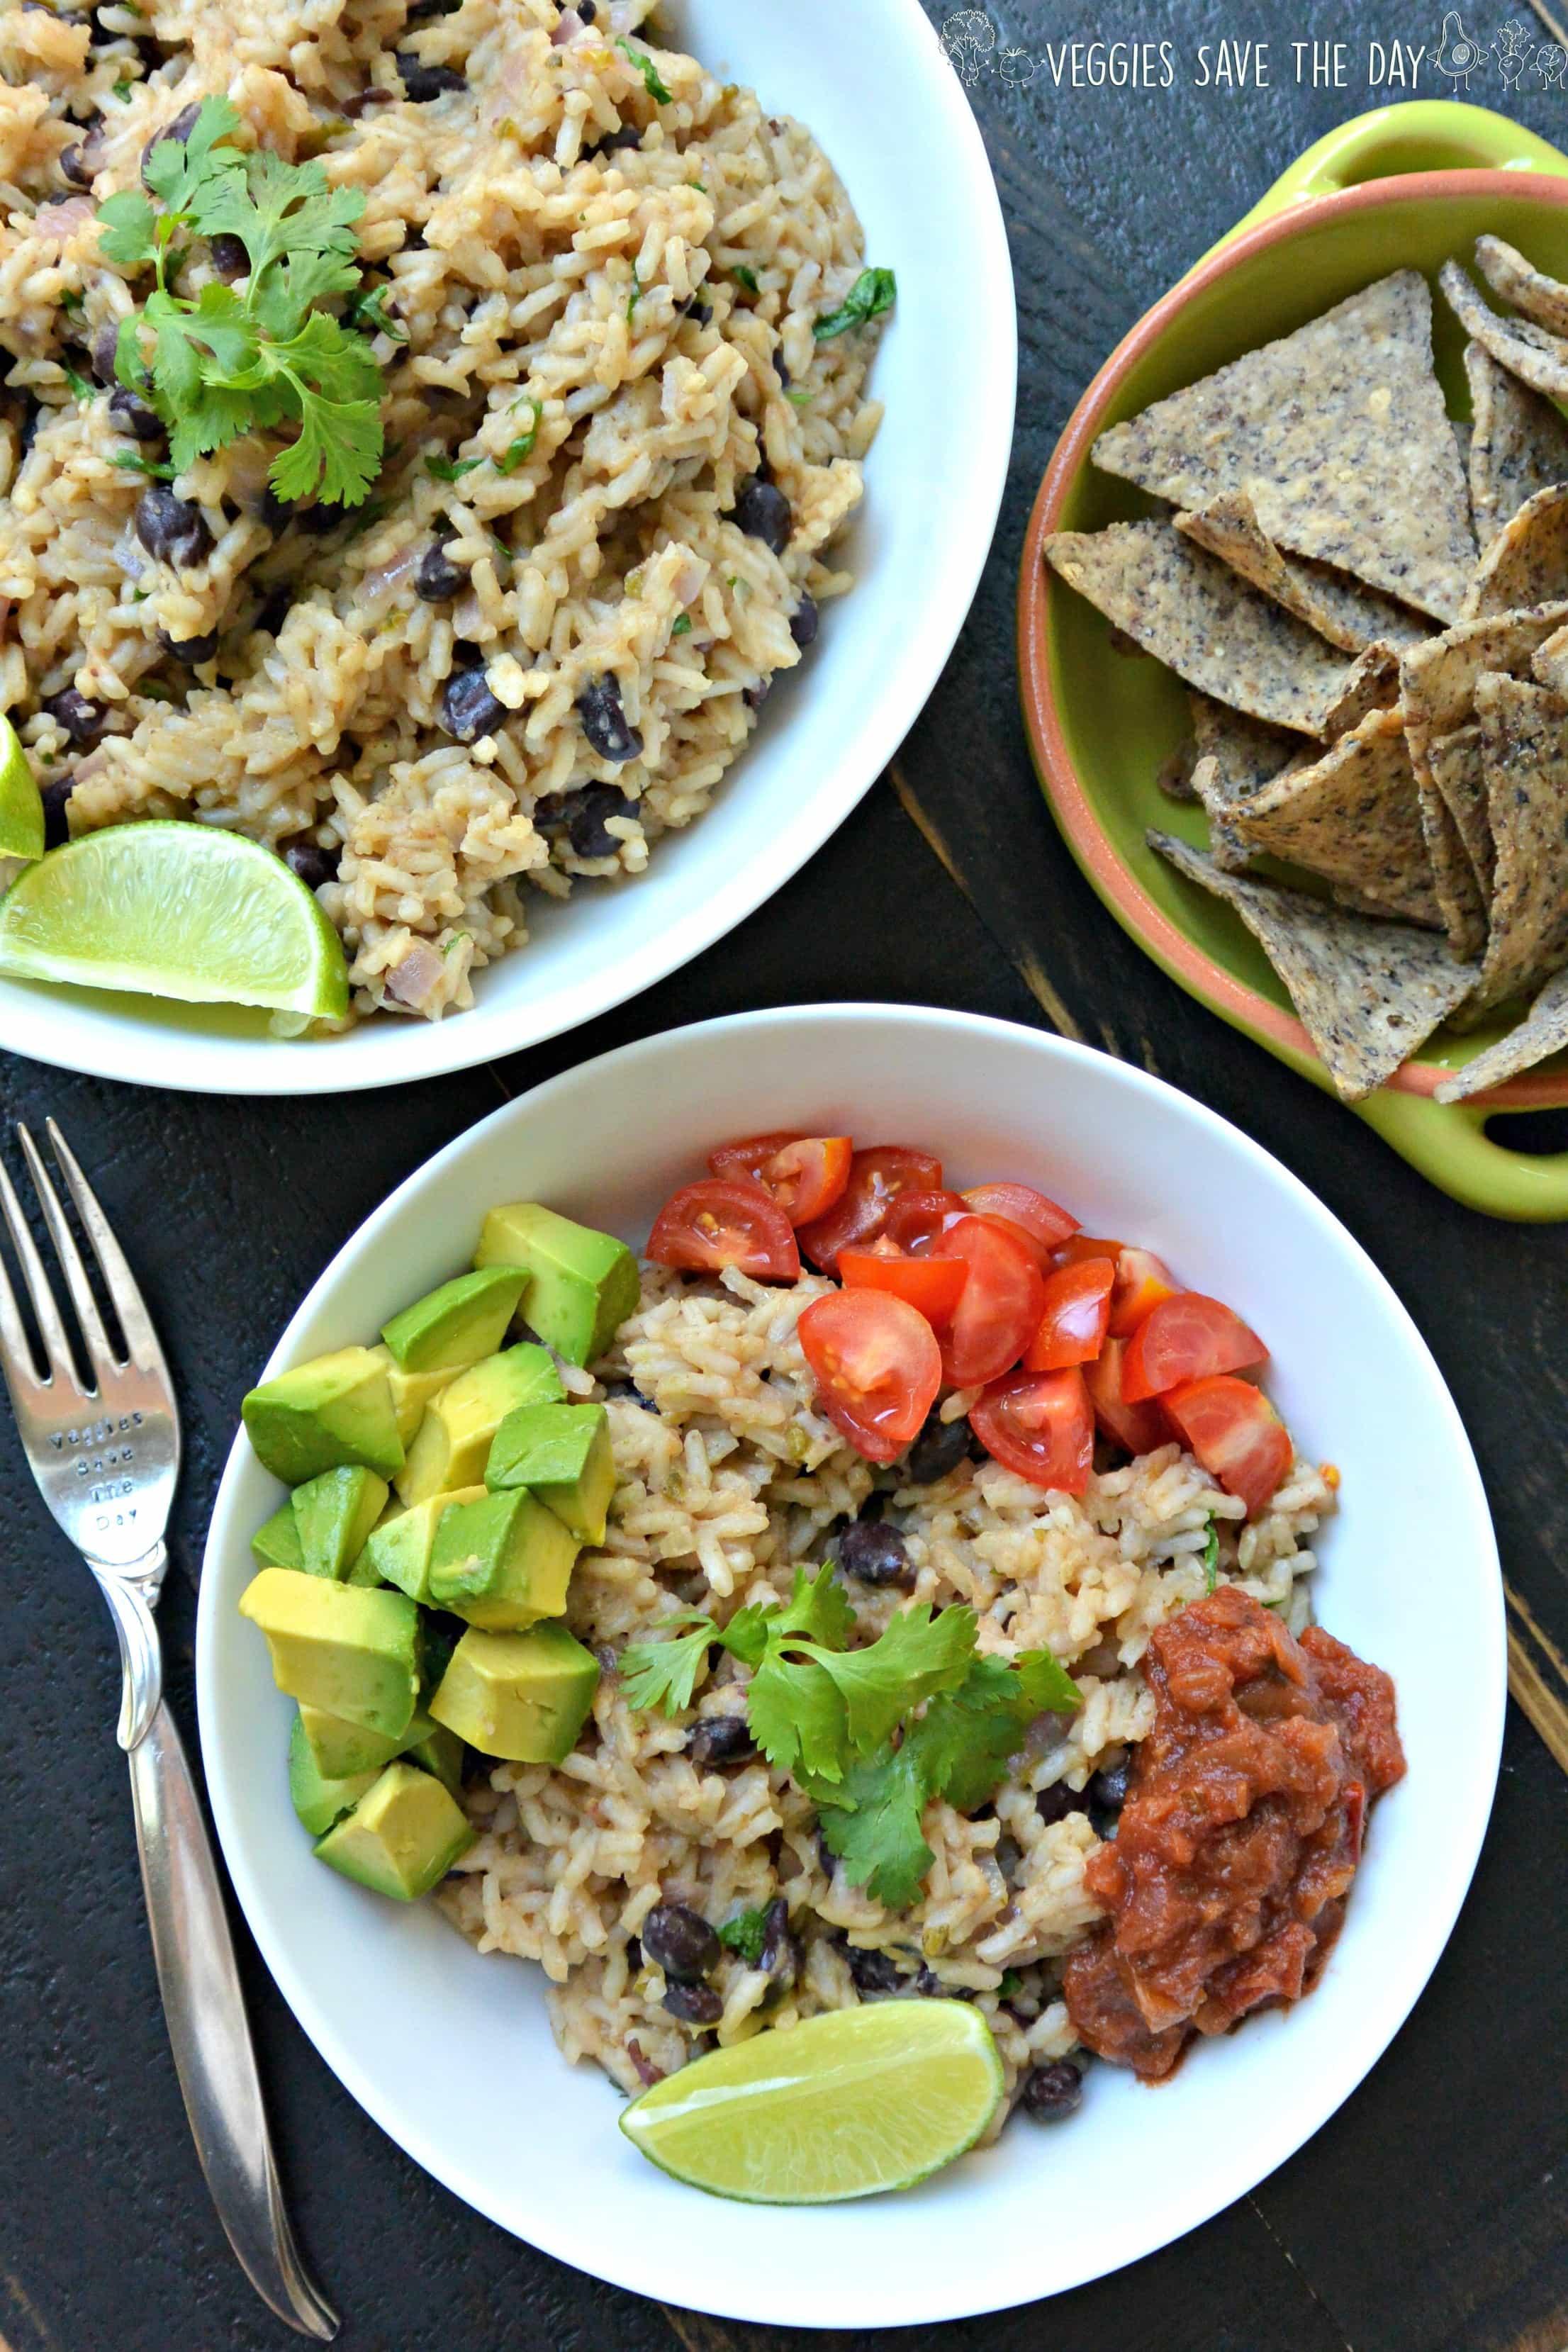 Gluten-Free Vegan Recipes -cilantro lime rice and black beans